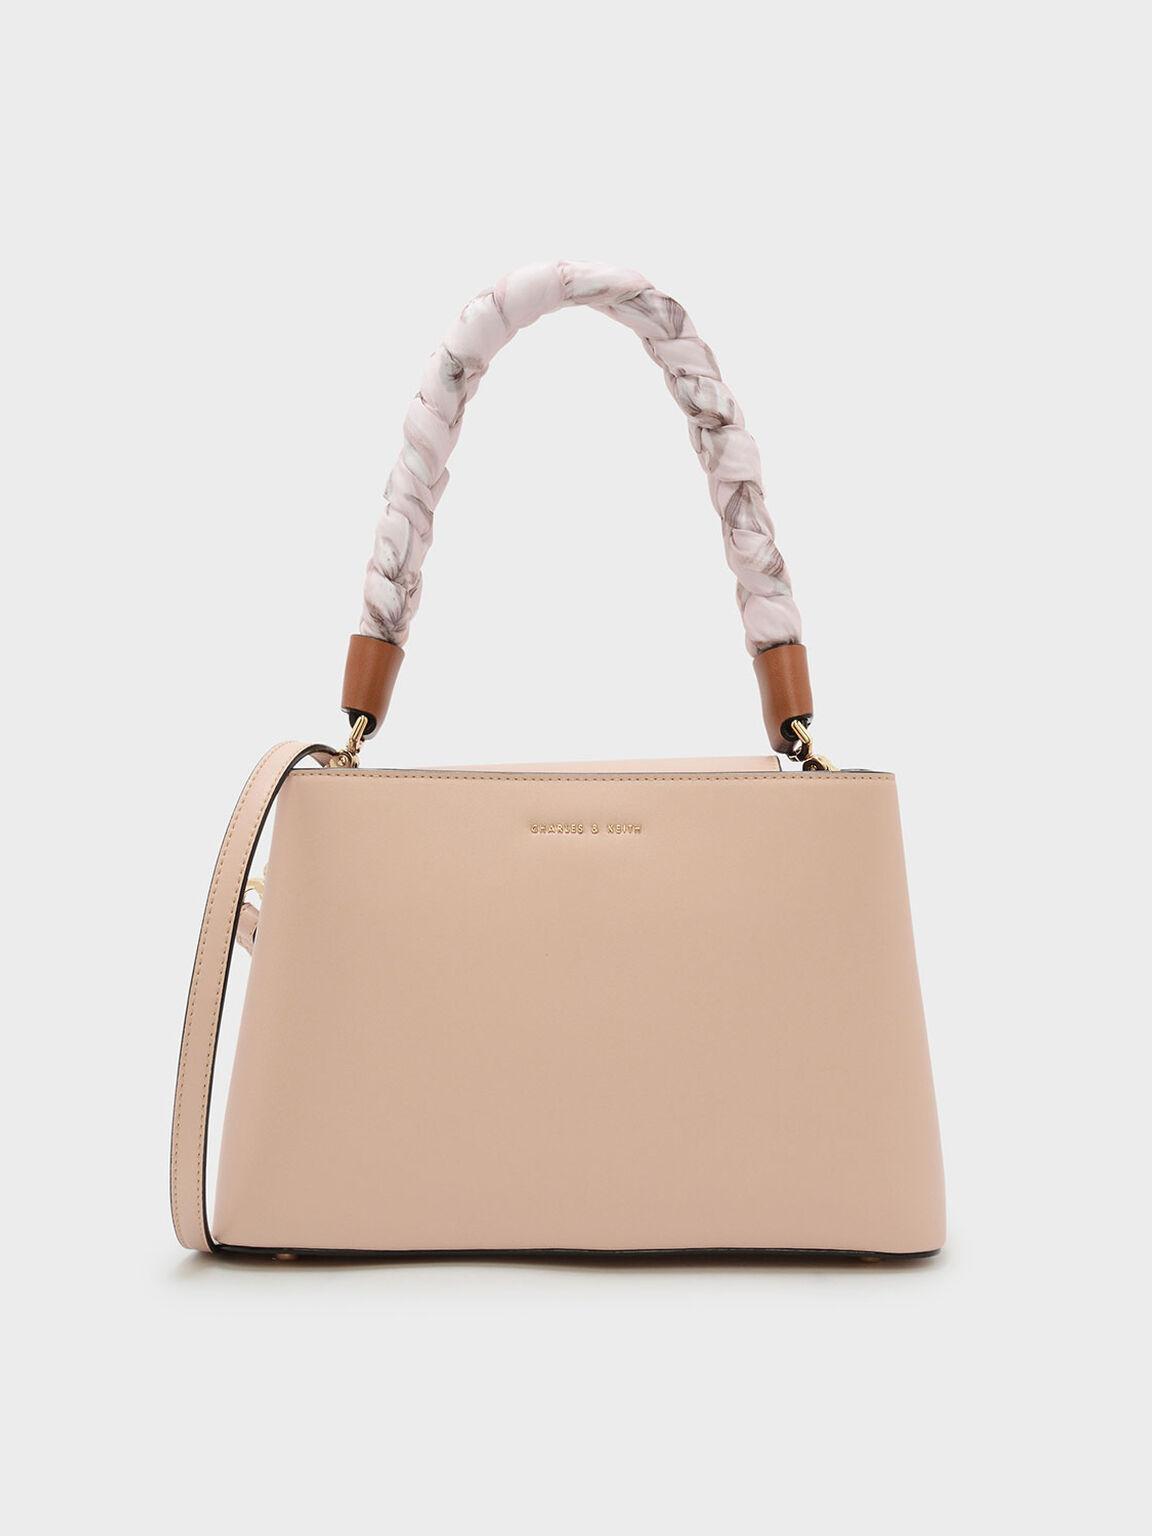 Scarf Wrapped Handle Handbag, Beige, hi-res